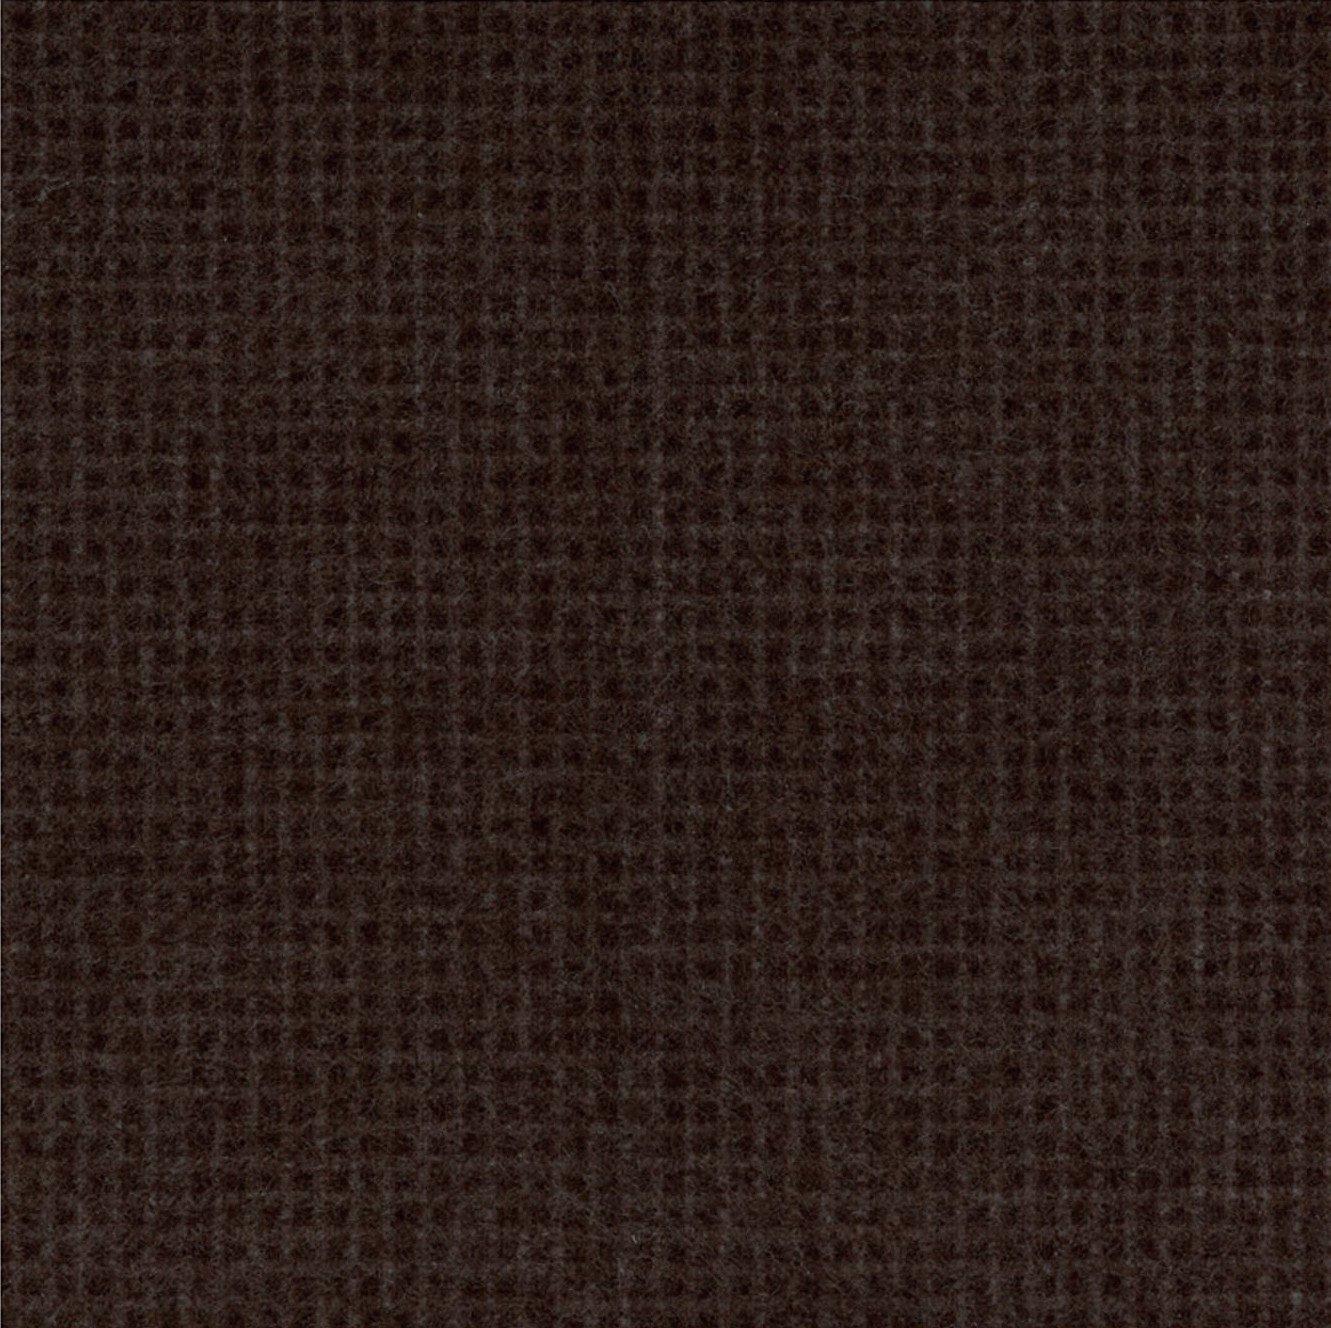 Woolies Flannel Tiny Windowpane Black (MASF18123-K)